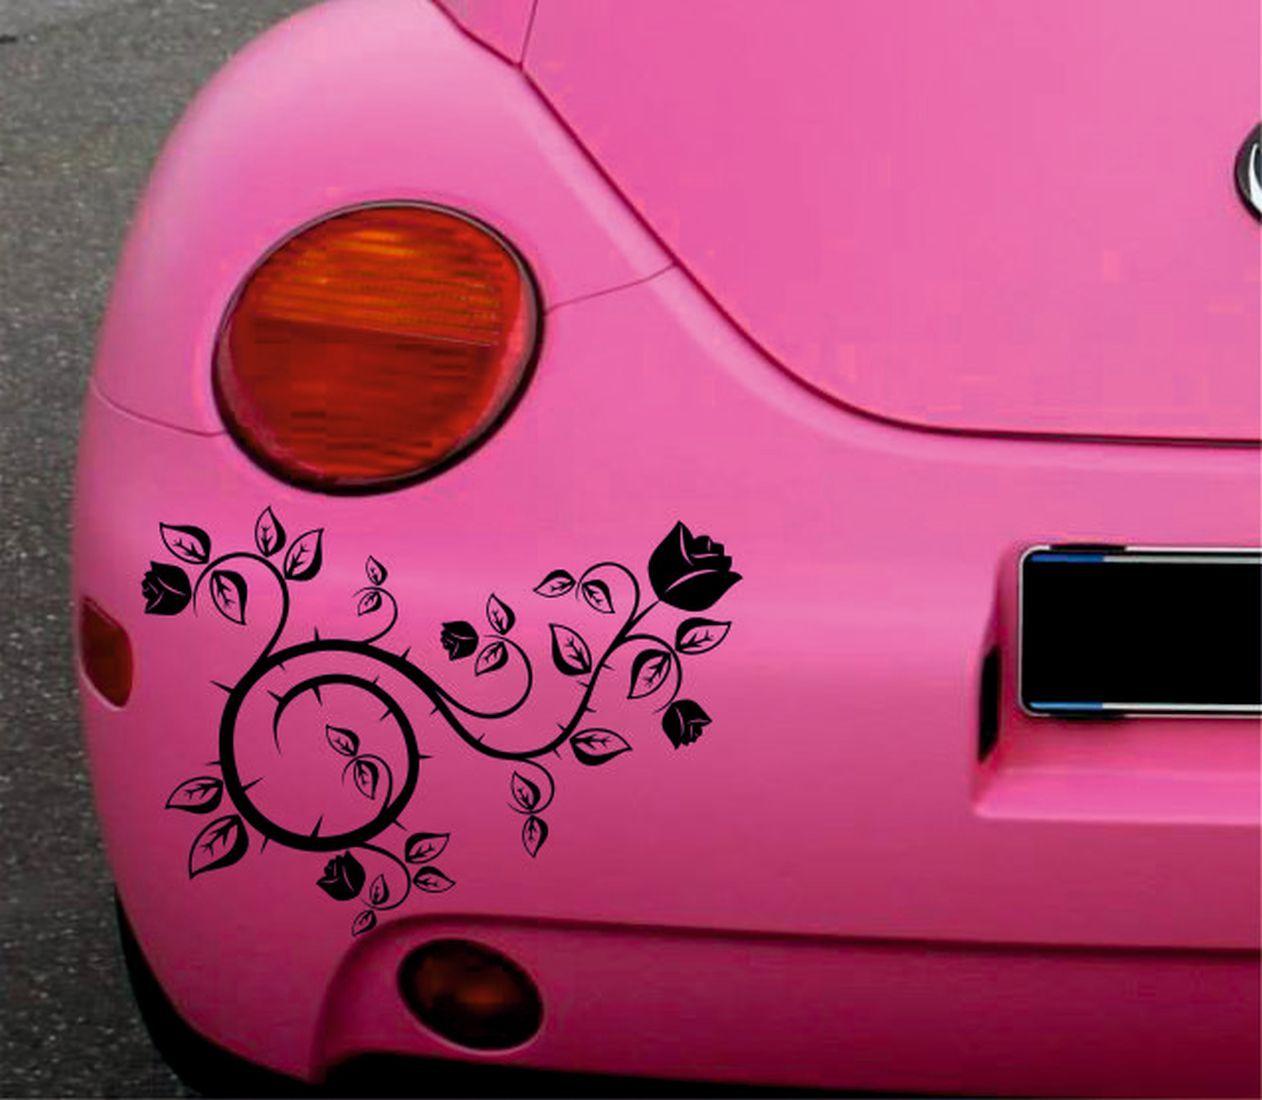 2x Rose Roses Floral Flower Car Sticker Van Stickers Gothic Etsy Vans Stickers Stickers Flower Car [ 1100 x 1262 Pixel ]